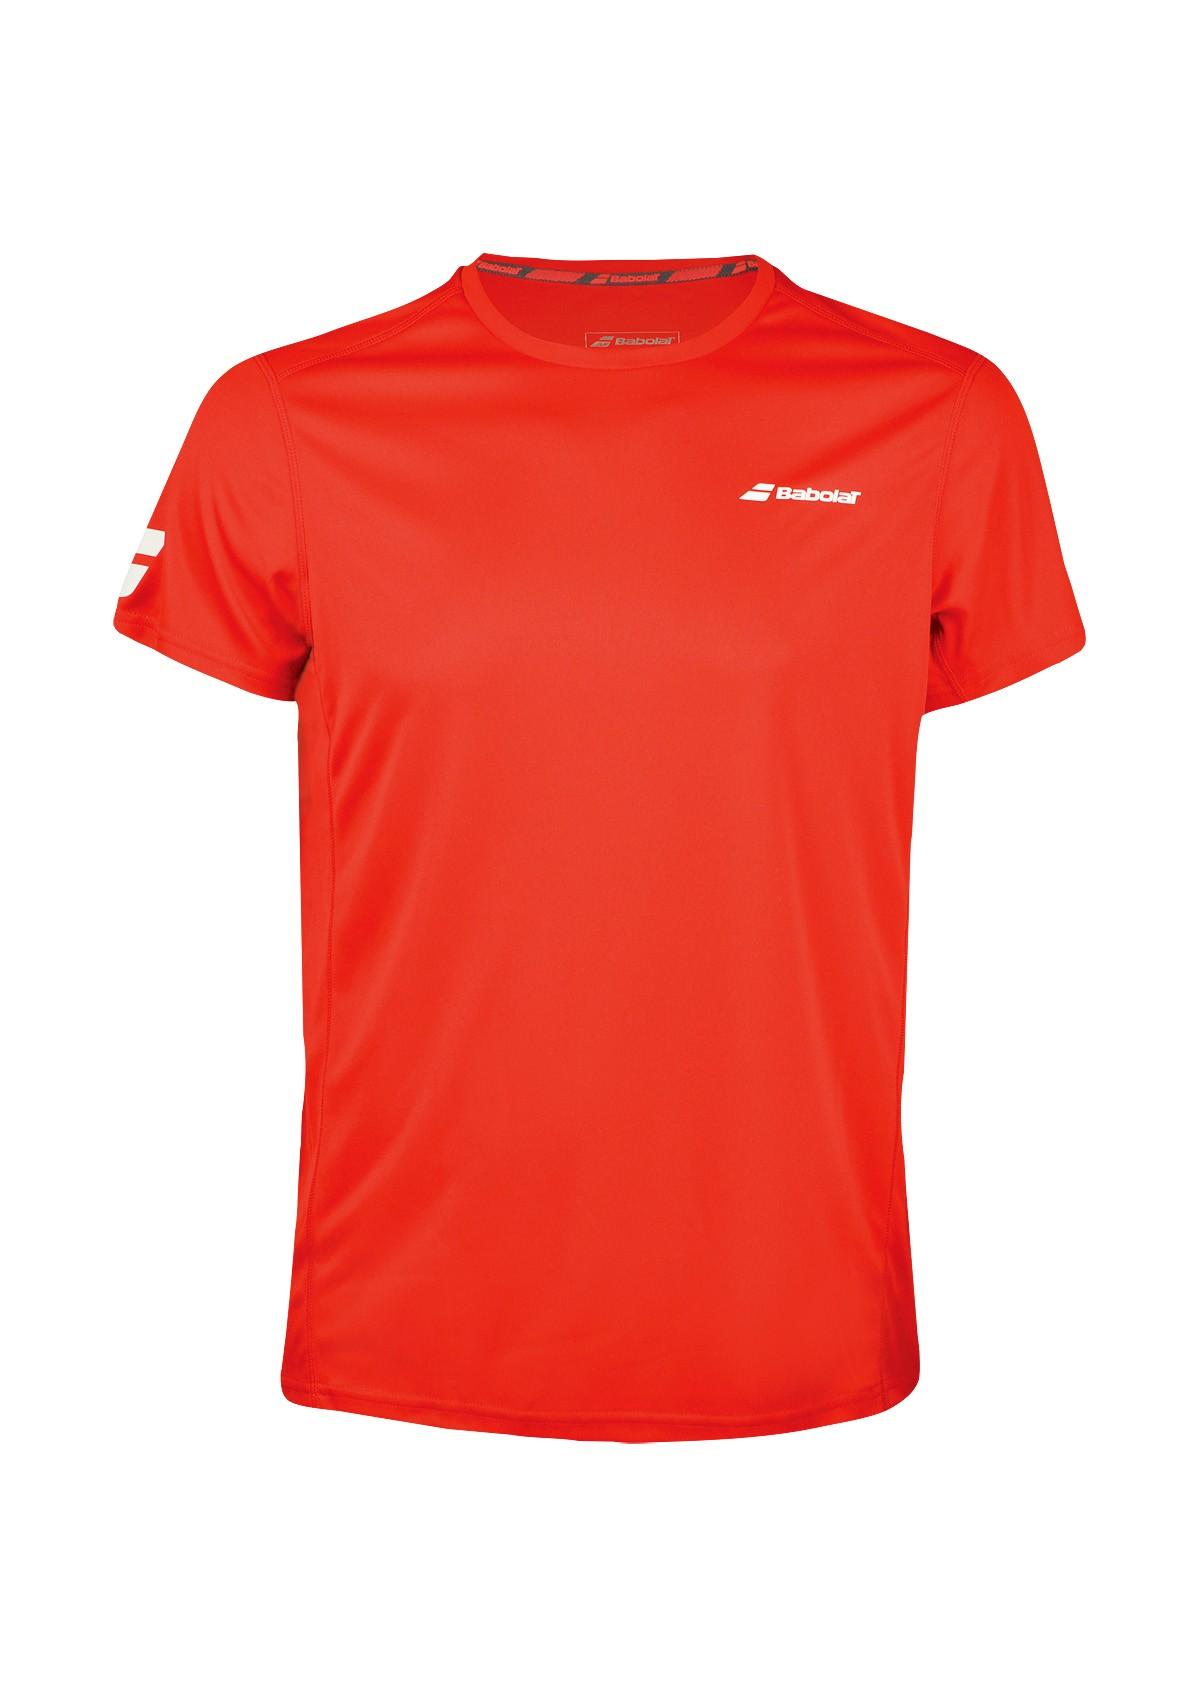 Koszulka tenisowa Babolat CORE T-shirt Red - 45%